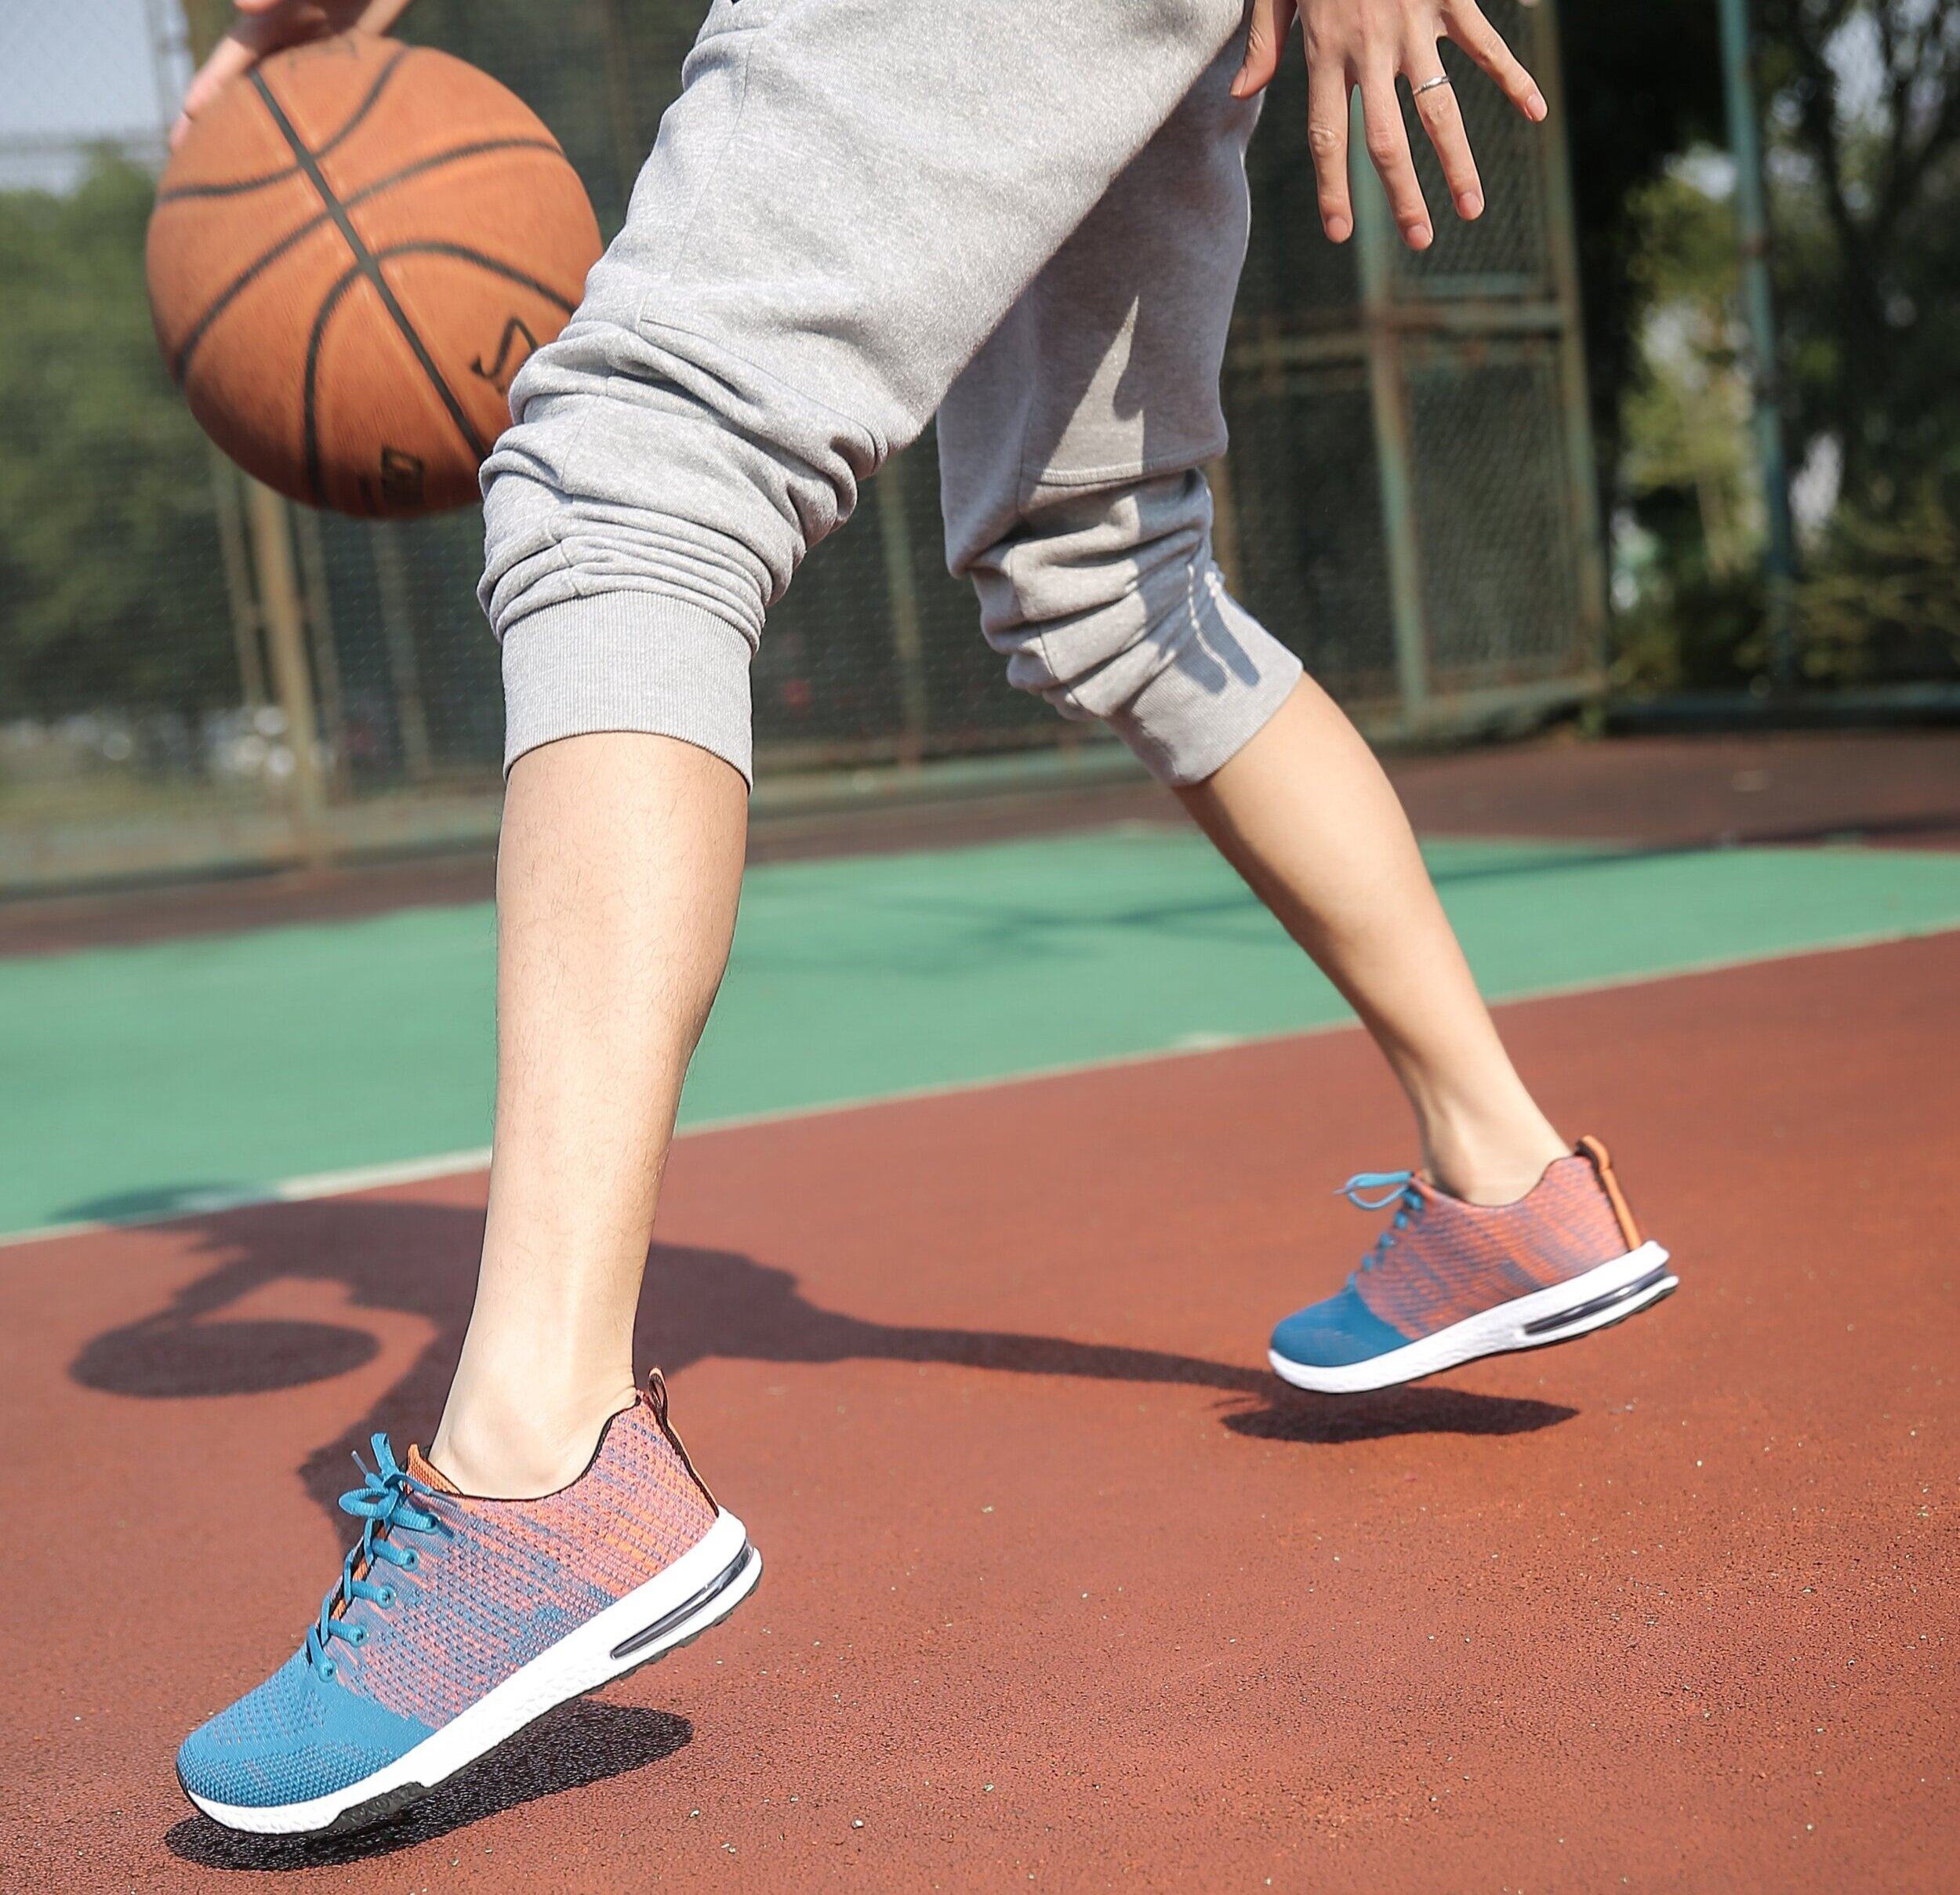 athlete-ball-feet-1522381.jpg